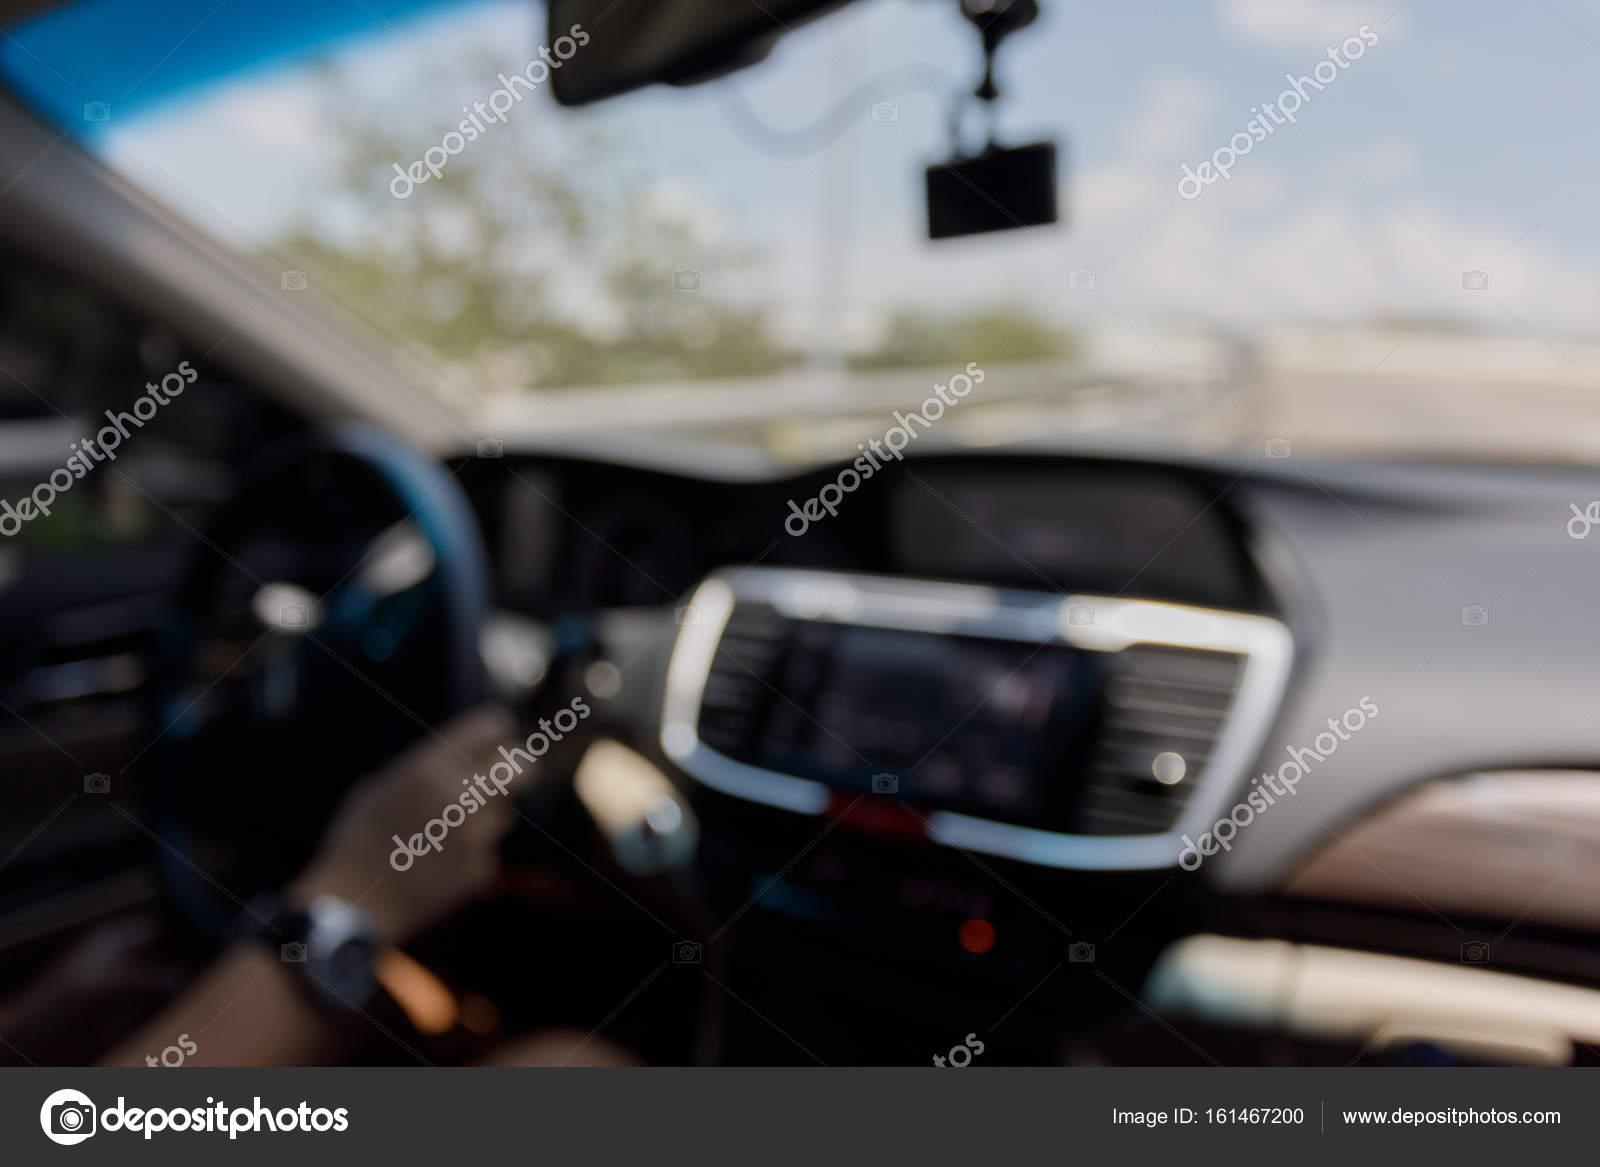 SHOFER DRIVERS